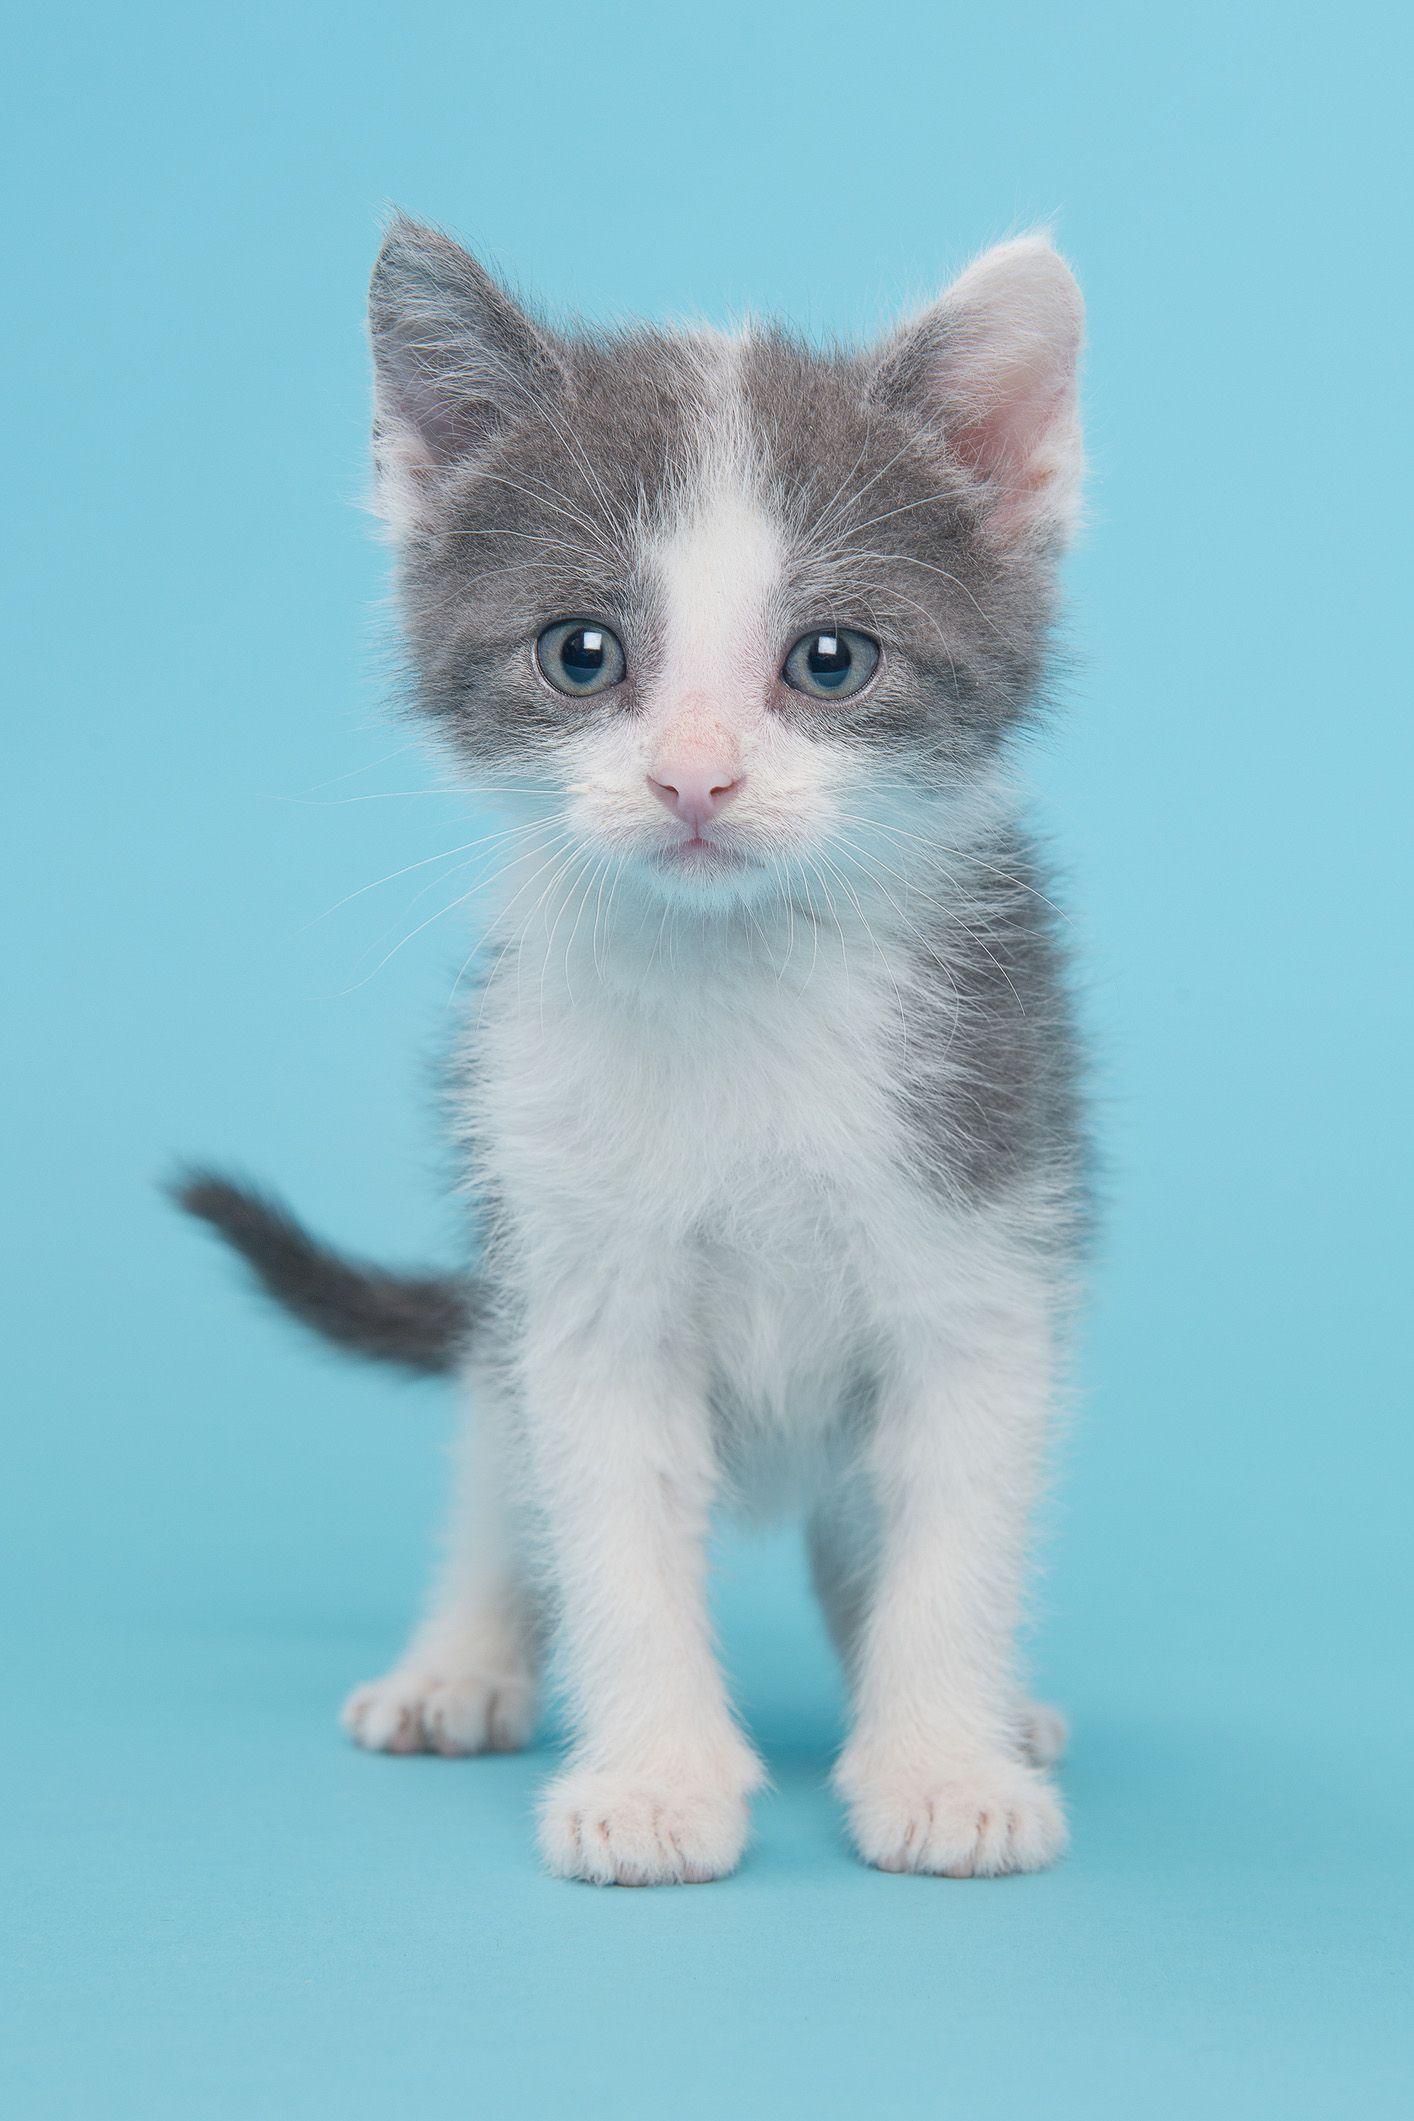 20 Cute Cat Names Adorable Boy And Girl Kitten Names